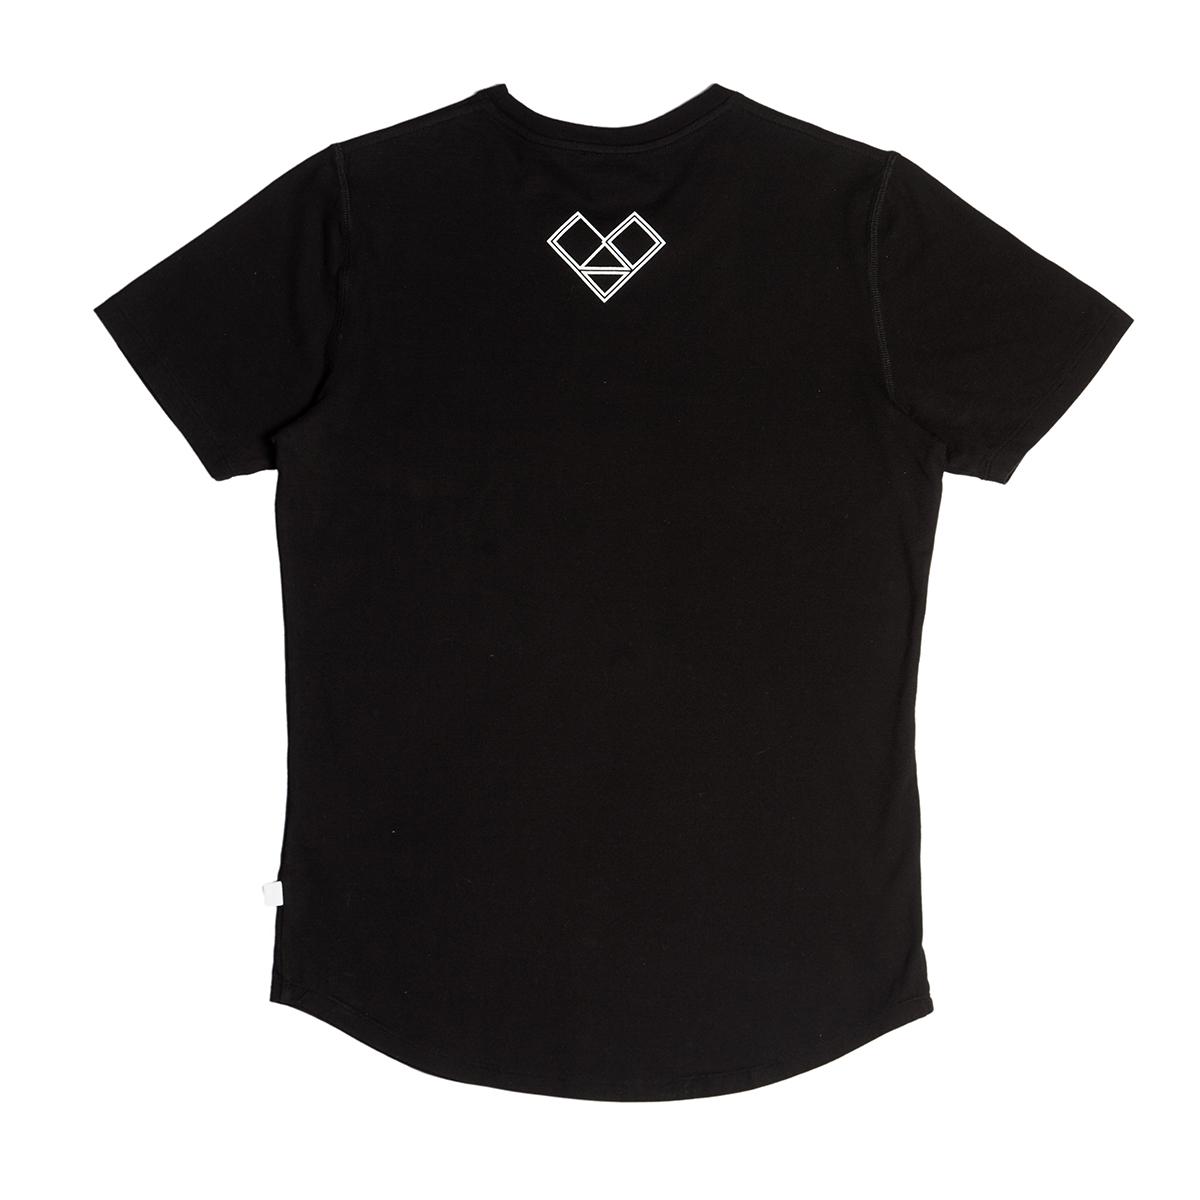 Linda Raff Collection -T-Shirt E-SABATO Black